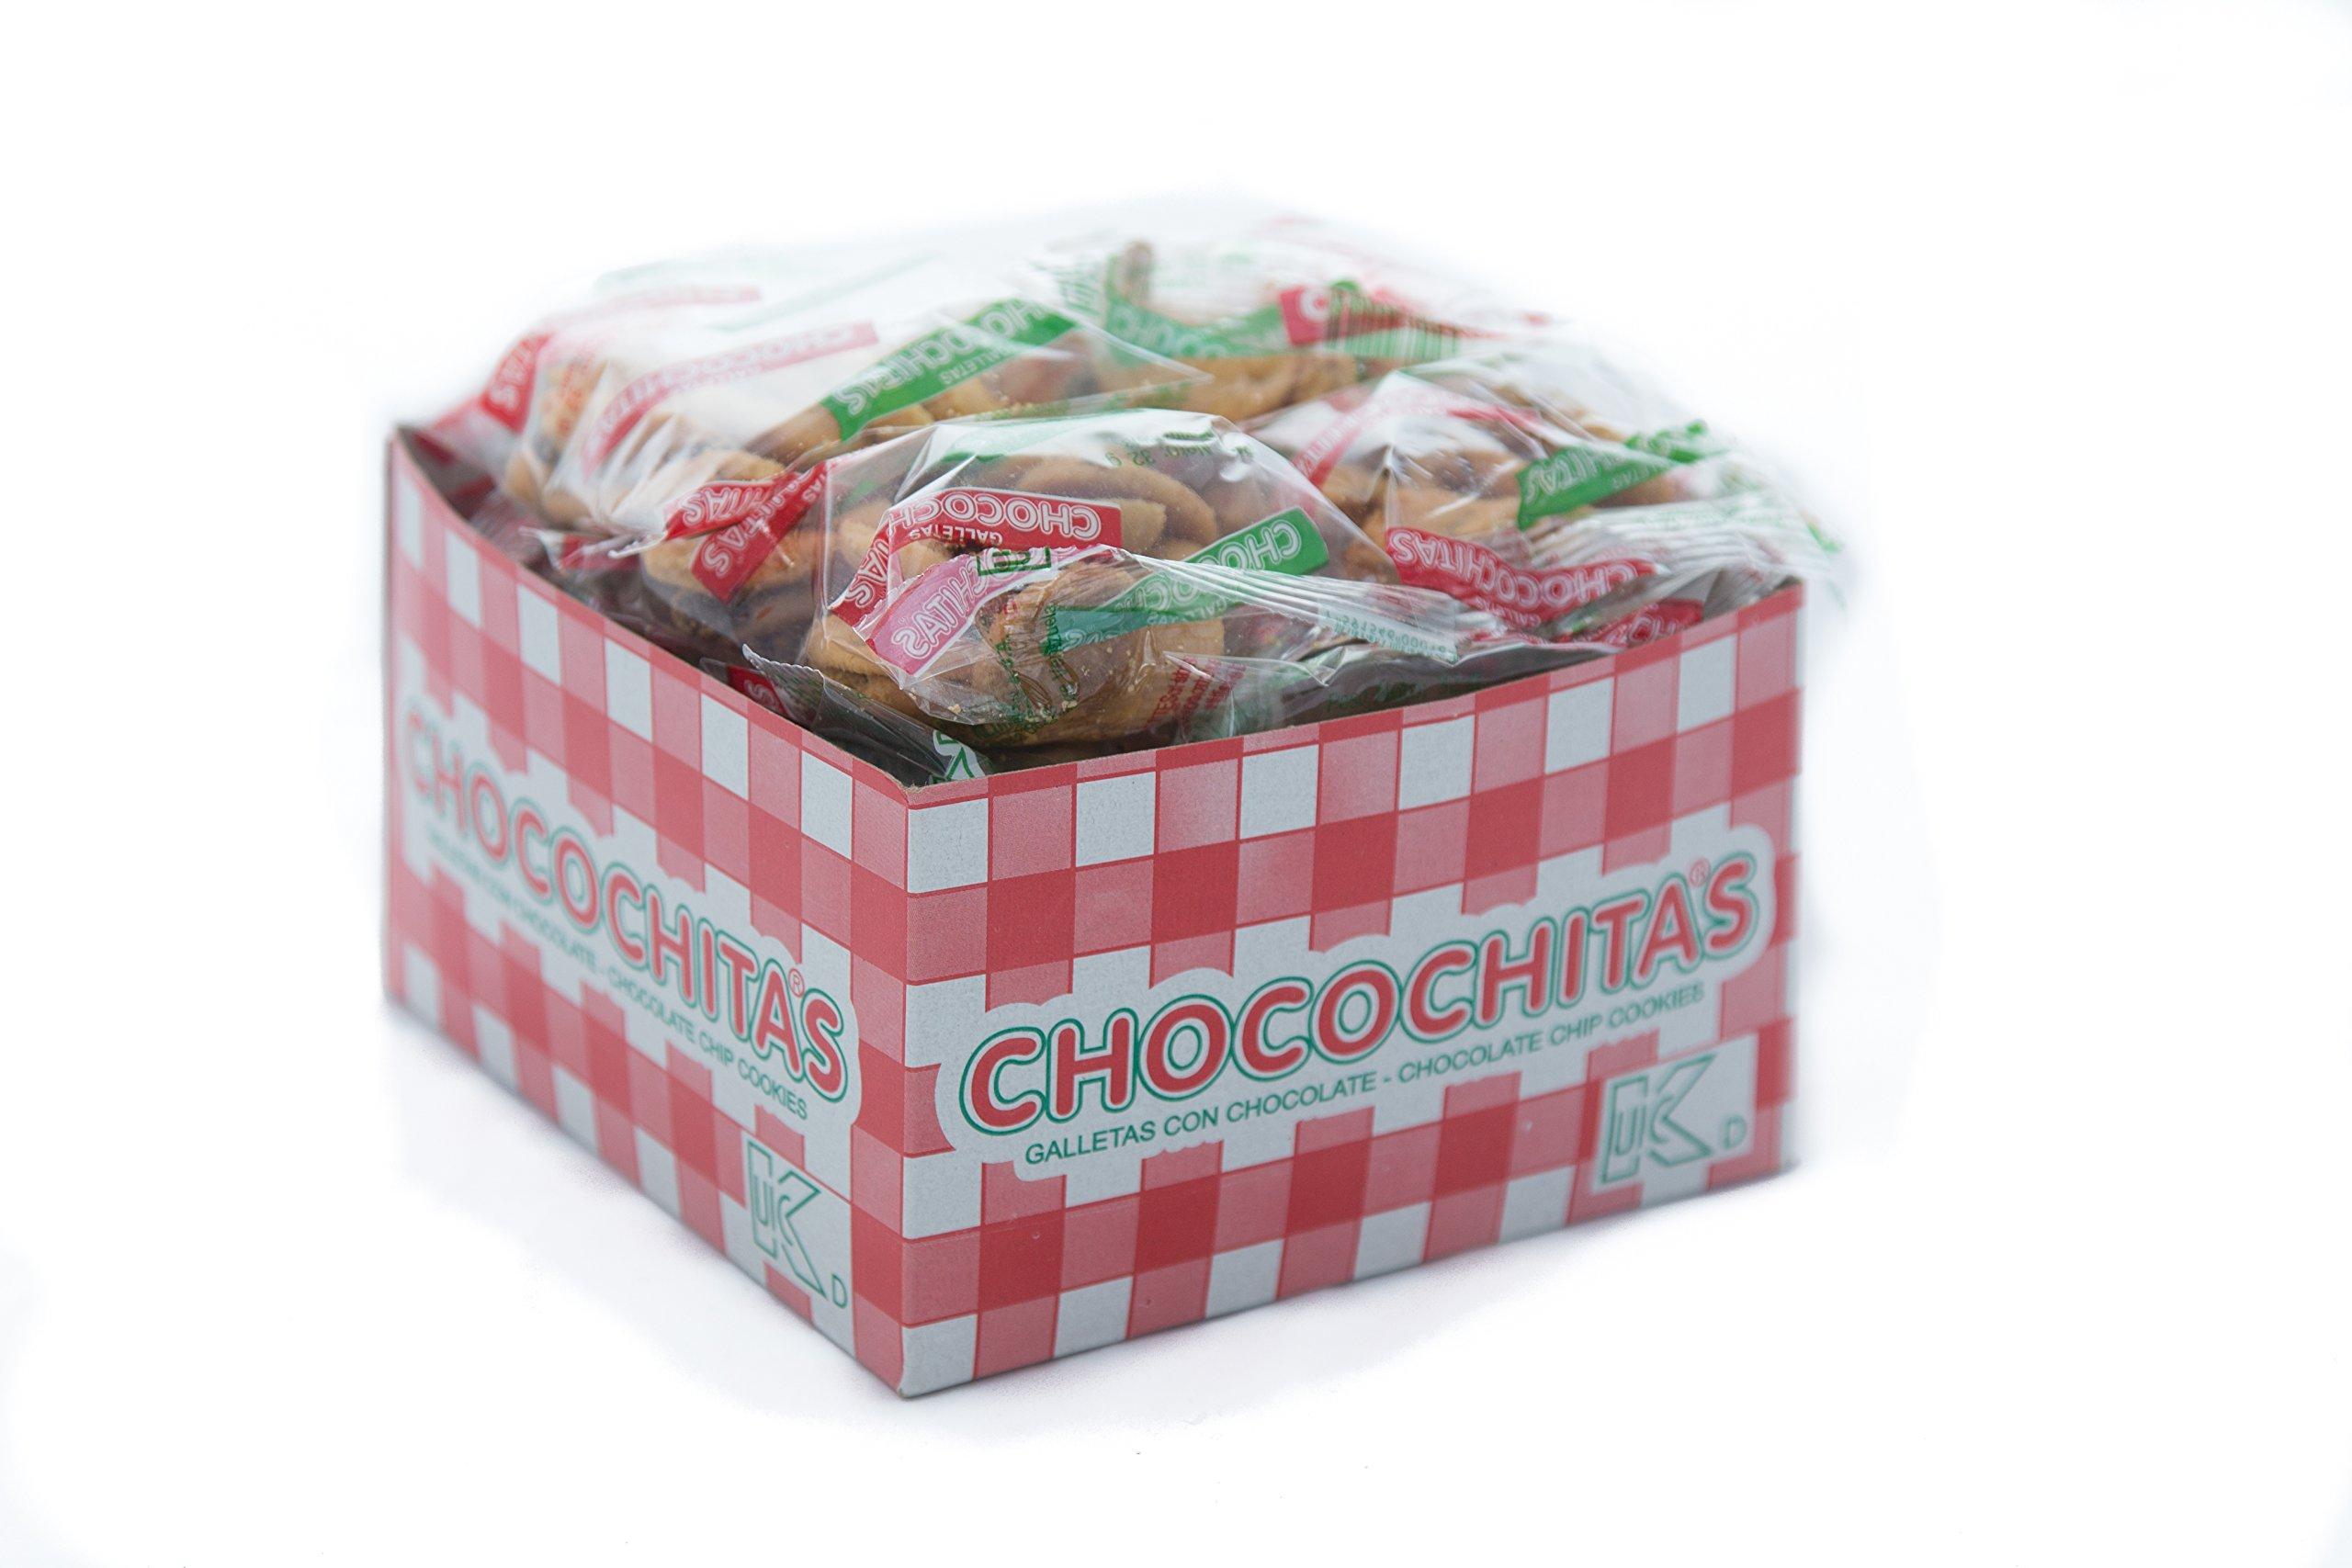 Chocochitas, the Best Venezuelan Chocolate Chip Cookies by Psycarts